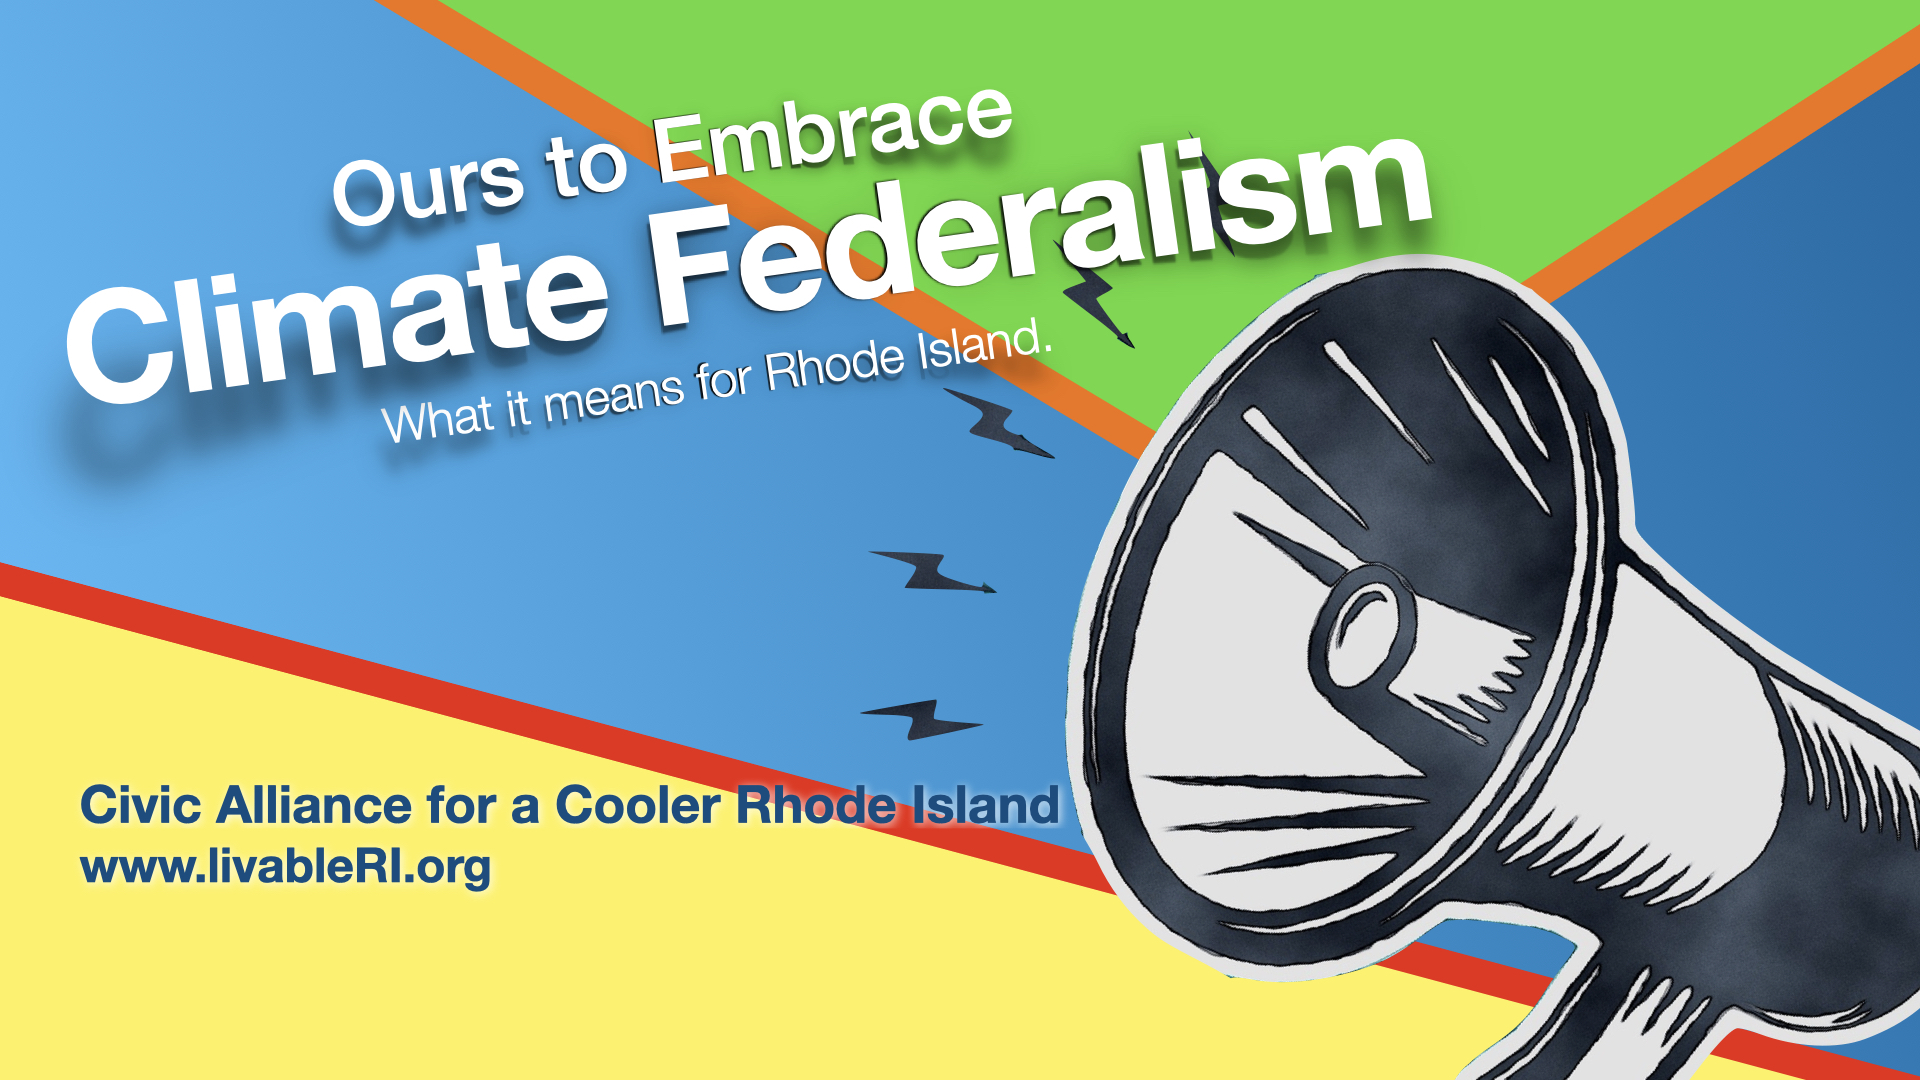 ClimateFederalismIntroSlide.001